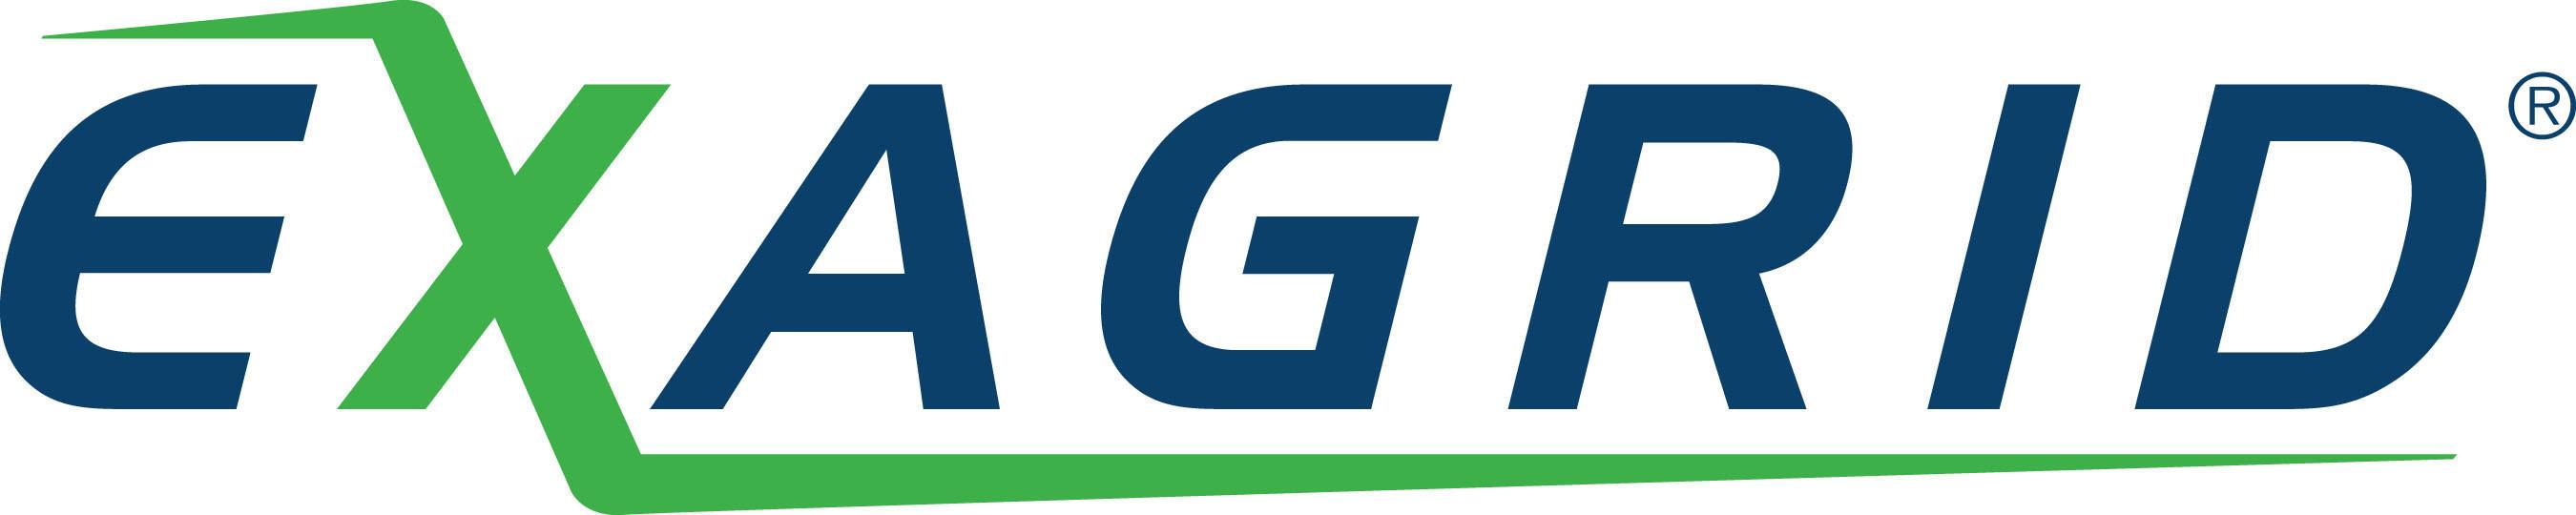 ExaGrid logo. (PRNewsFoto/ExaGrid)